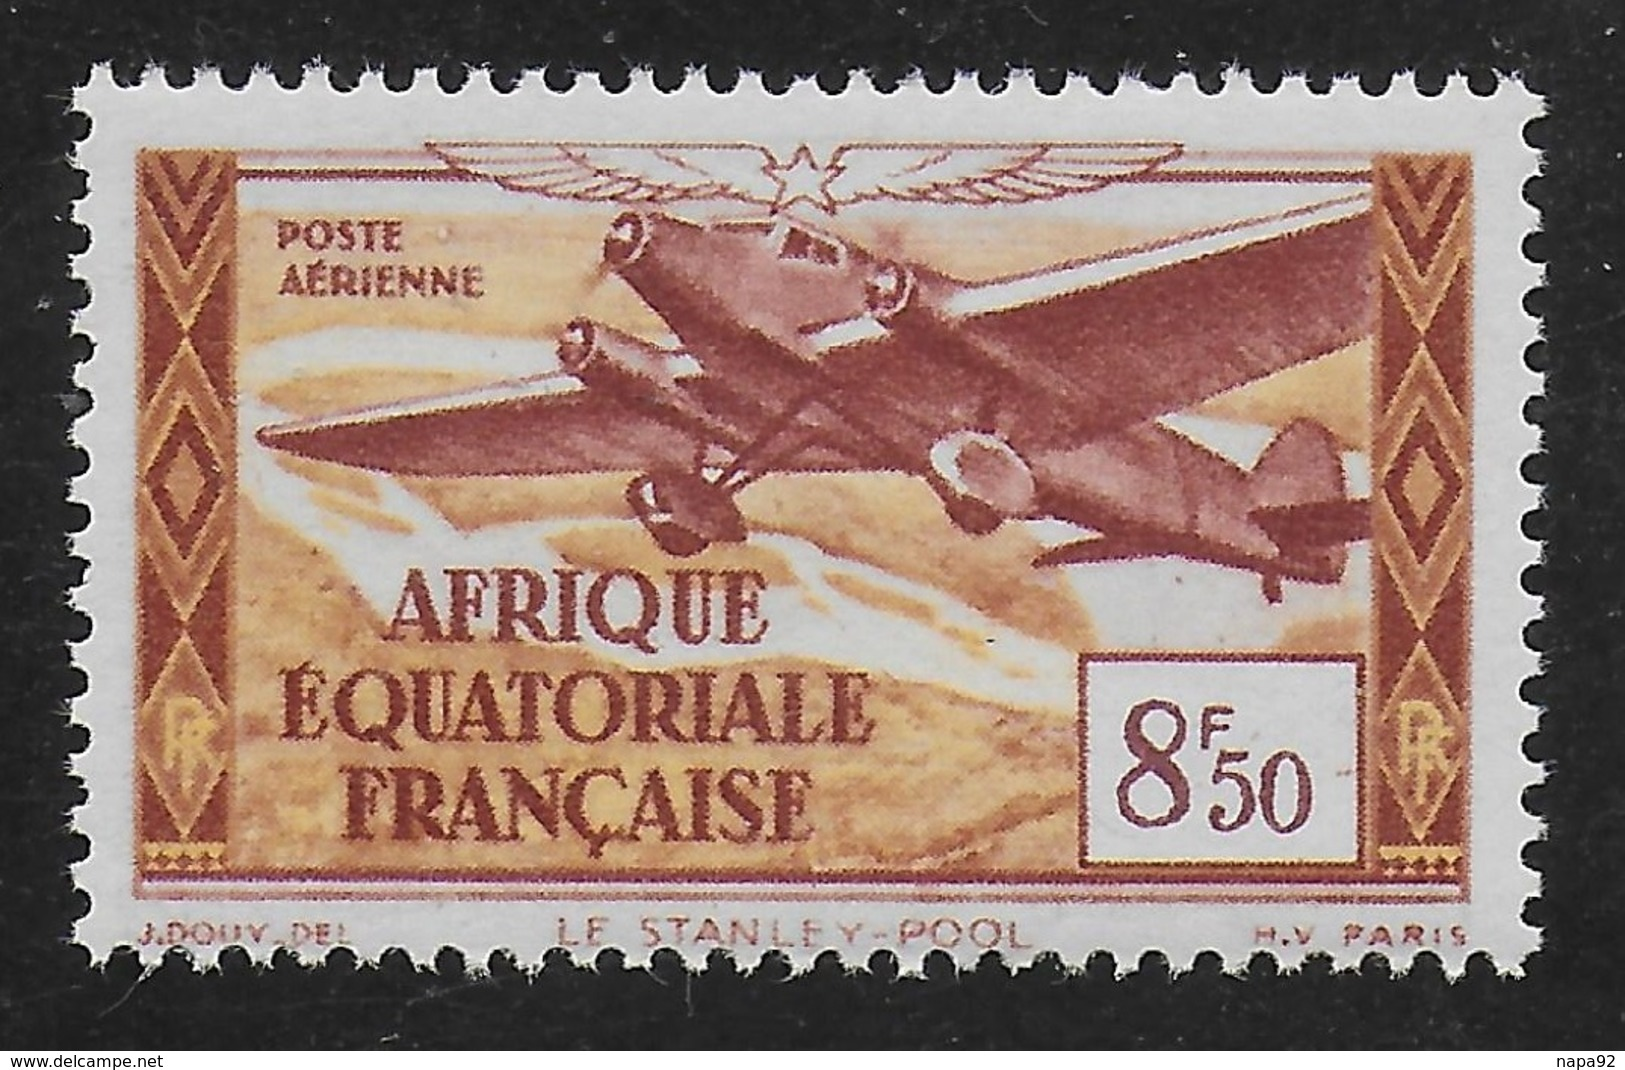 AFRIQUE EQUATORIALE FRANCAISE - AEF - A.E.F. - 1937 - YT PA 7** - MNH - A.E.F. (1936-1958)